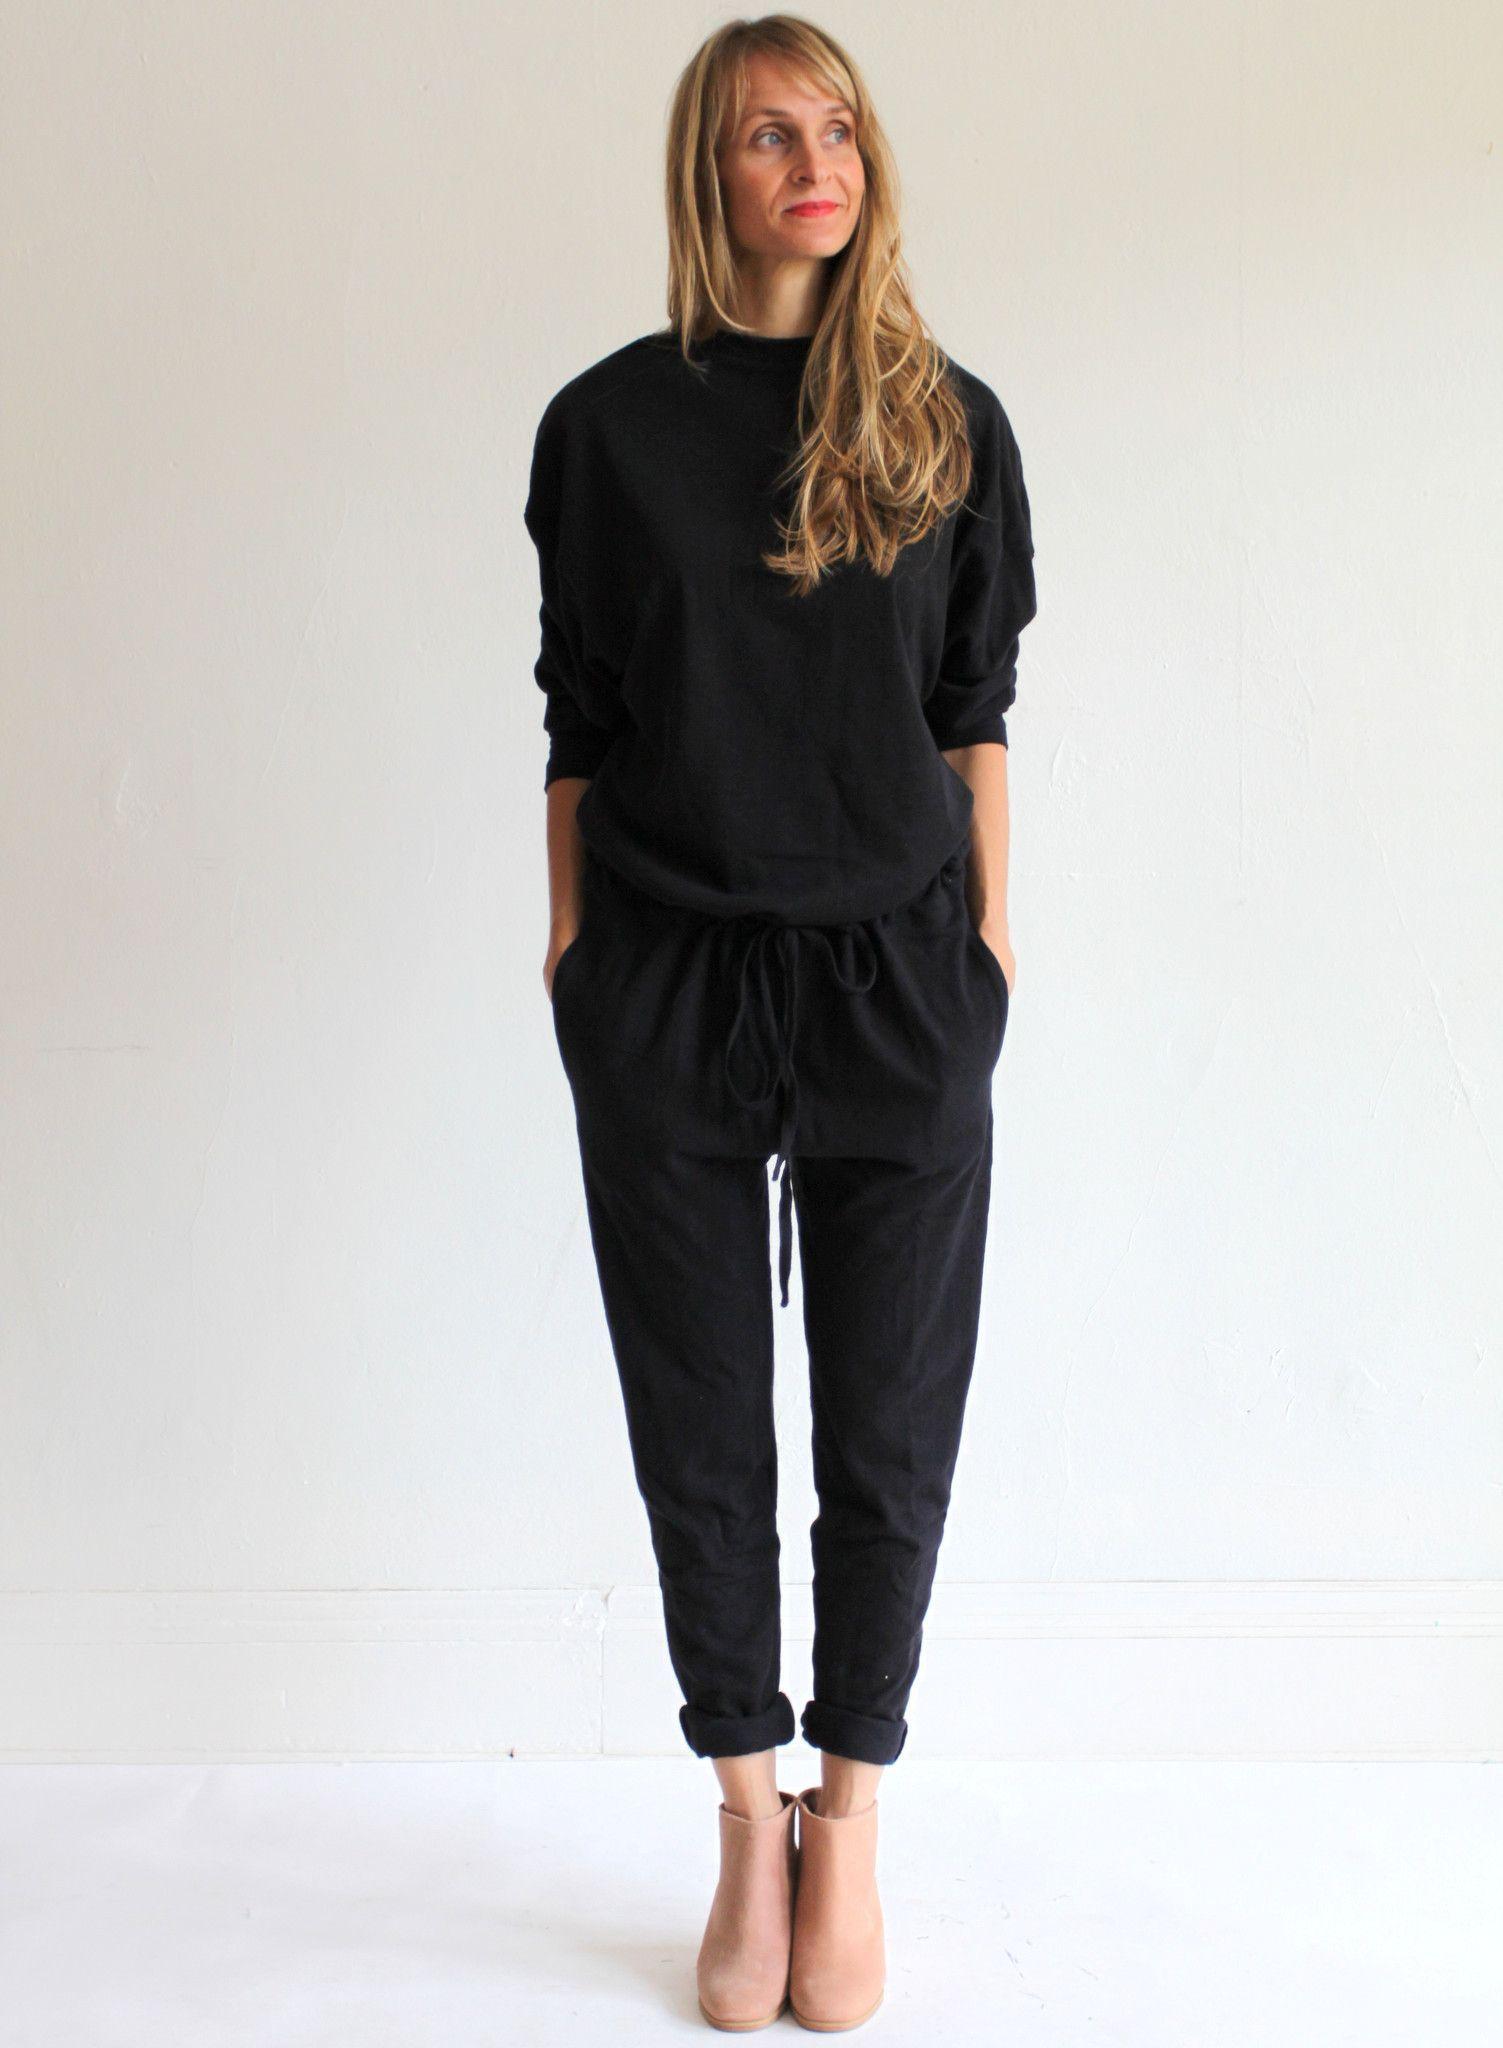 df0c6be474a1 The Podolls Drawstring Jumpsuit - Organic Black